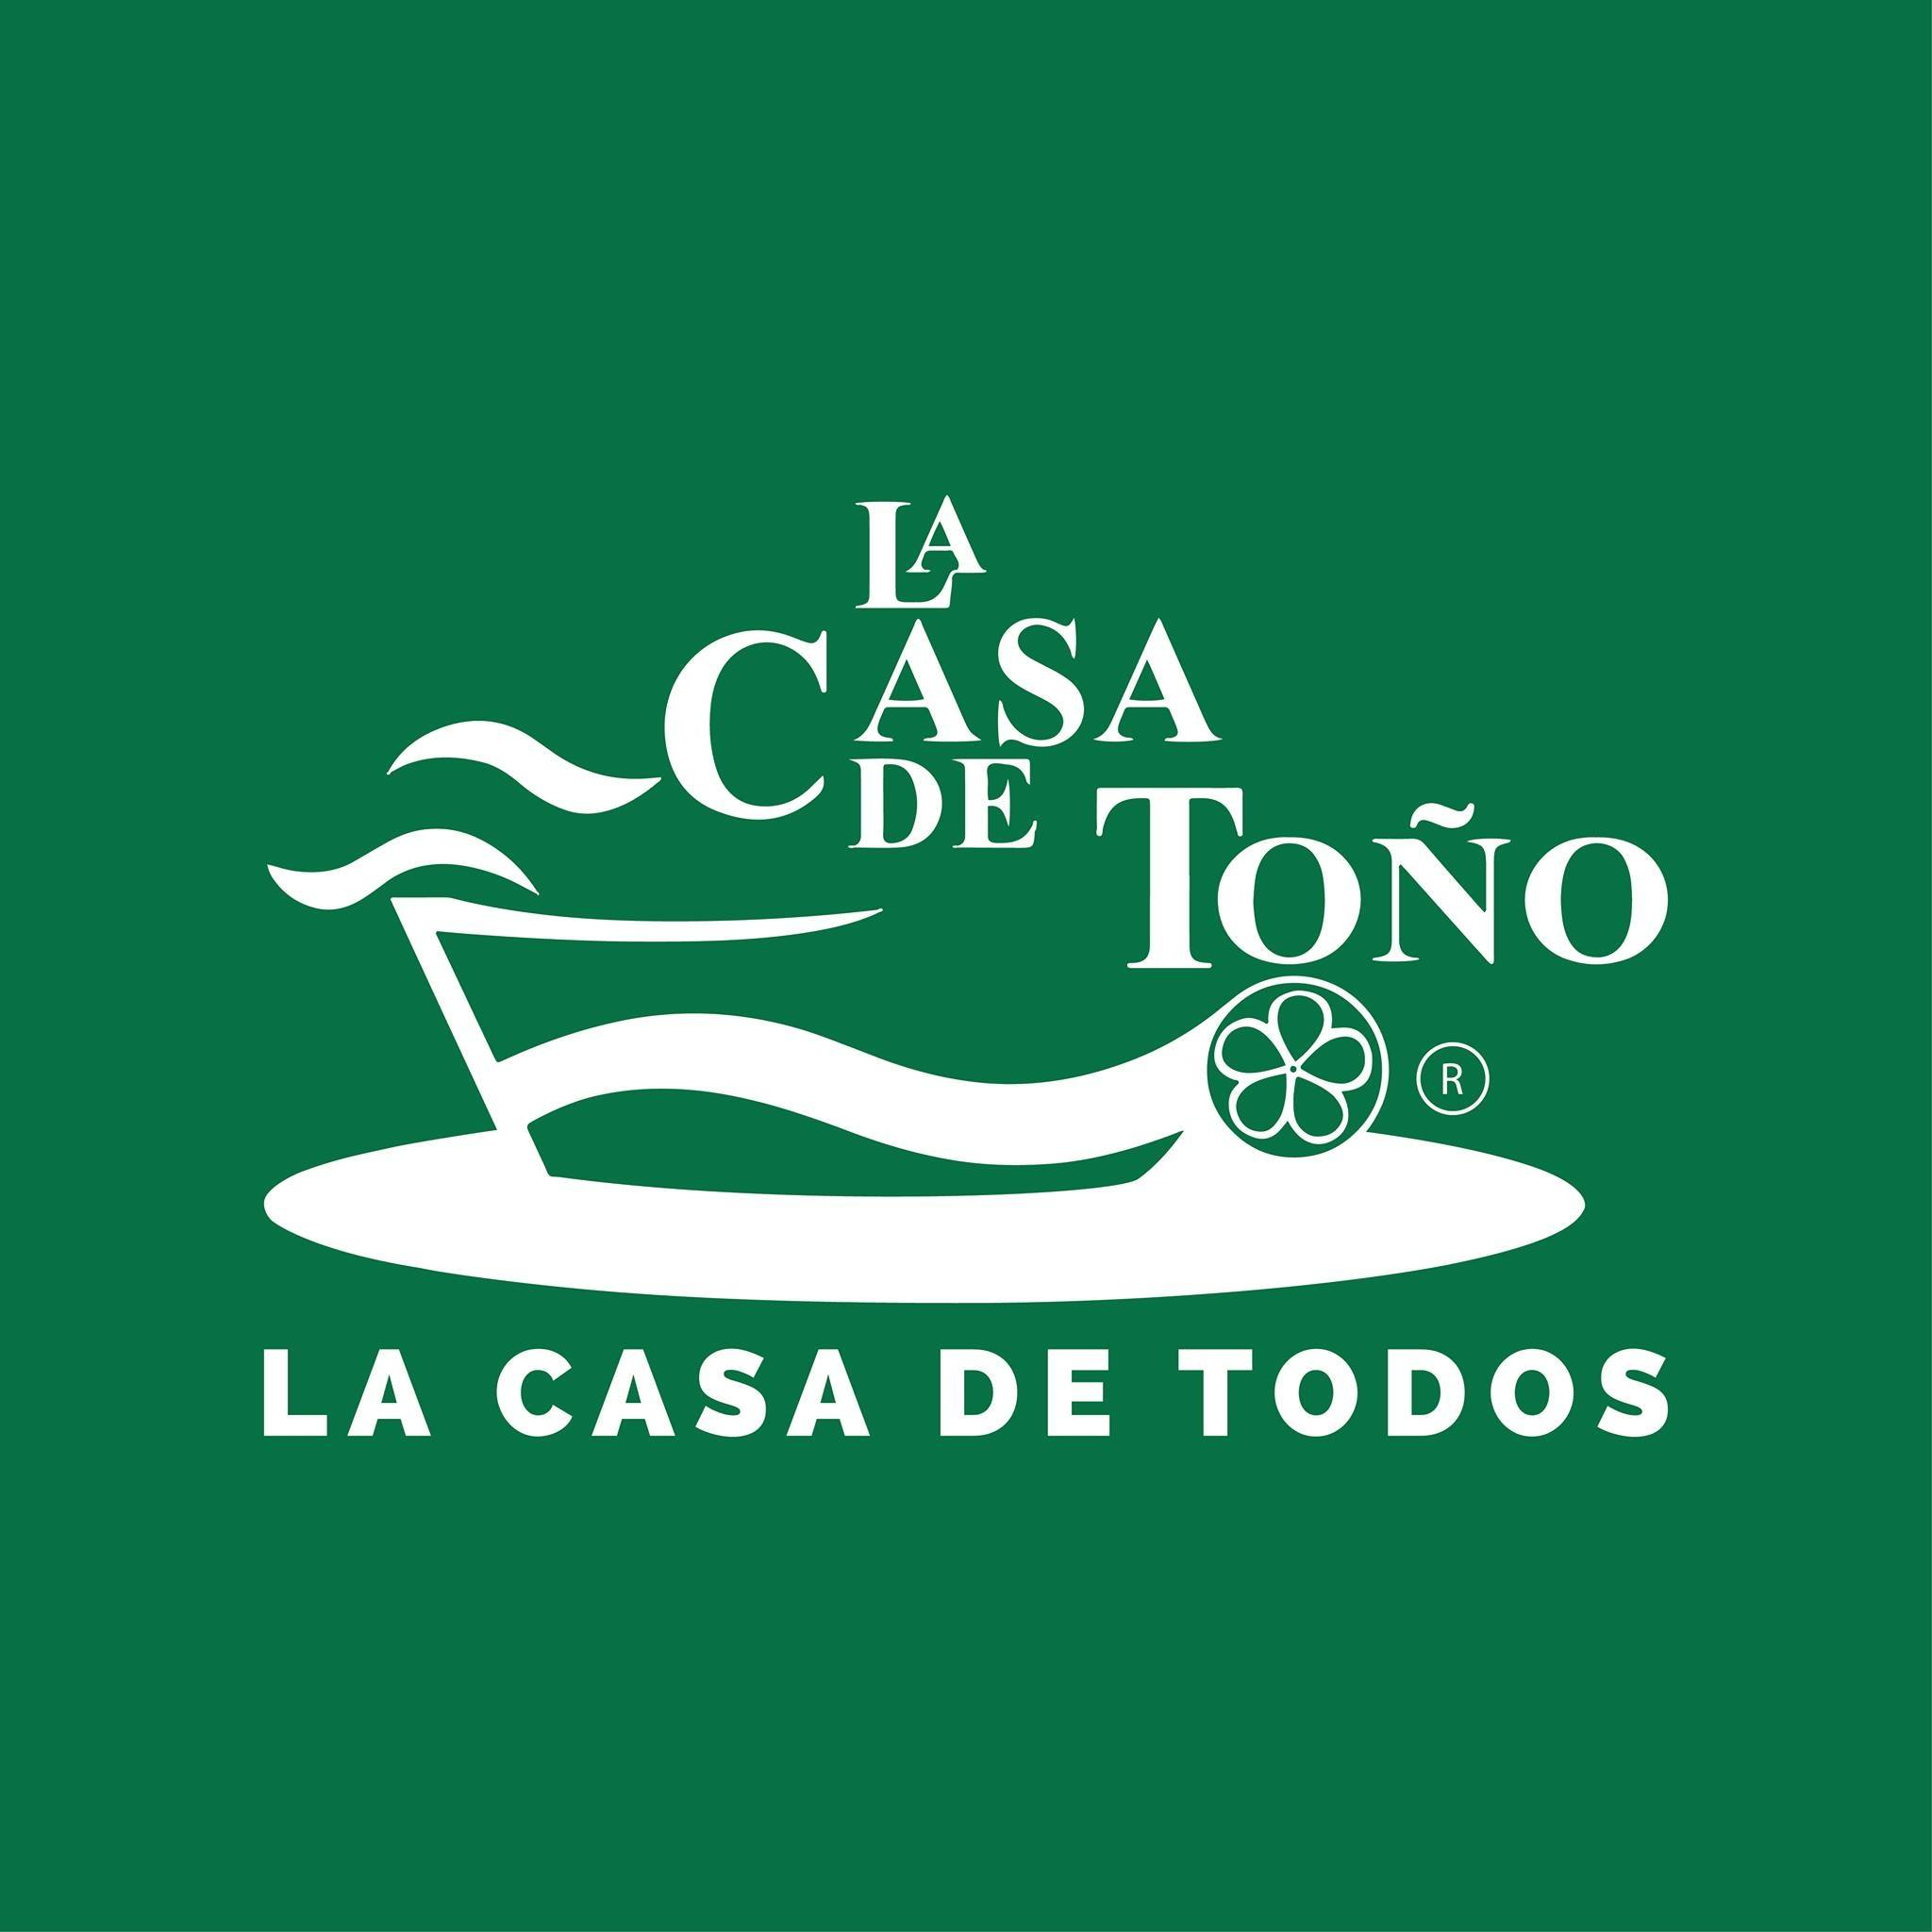 https://0201.nccdn.net/1_2/000/000/12e/0af/logo-casa-de-ton--o.jpeg